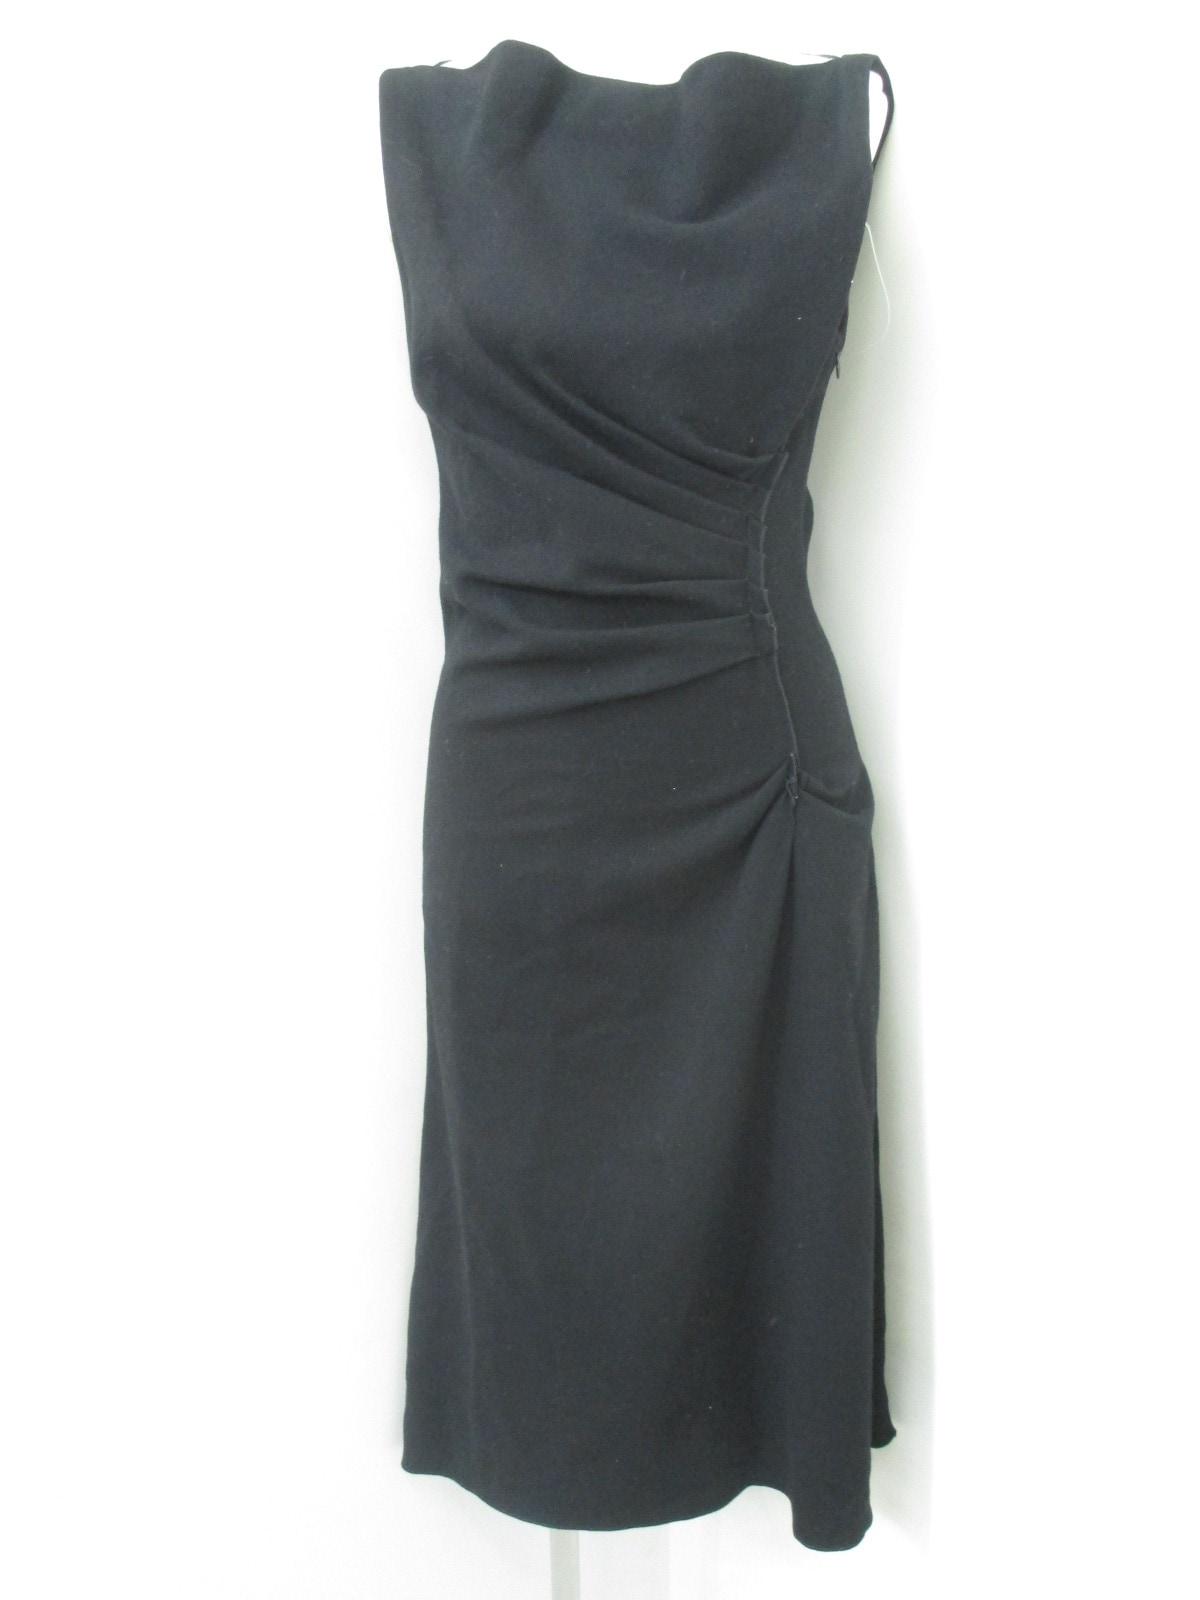 BODY DRESSING Deluxe(ボディドレッシングデラックス)のドレス